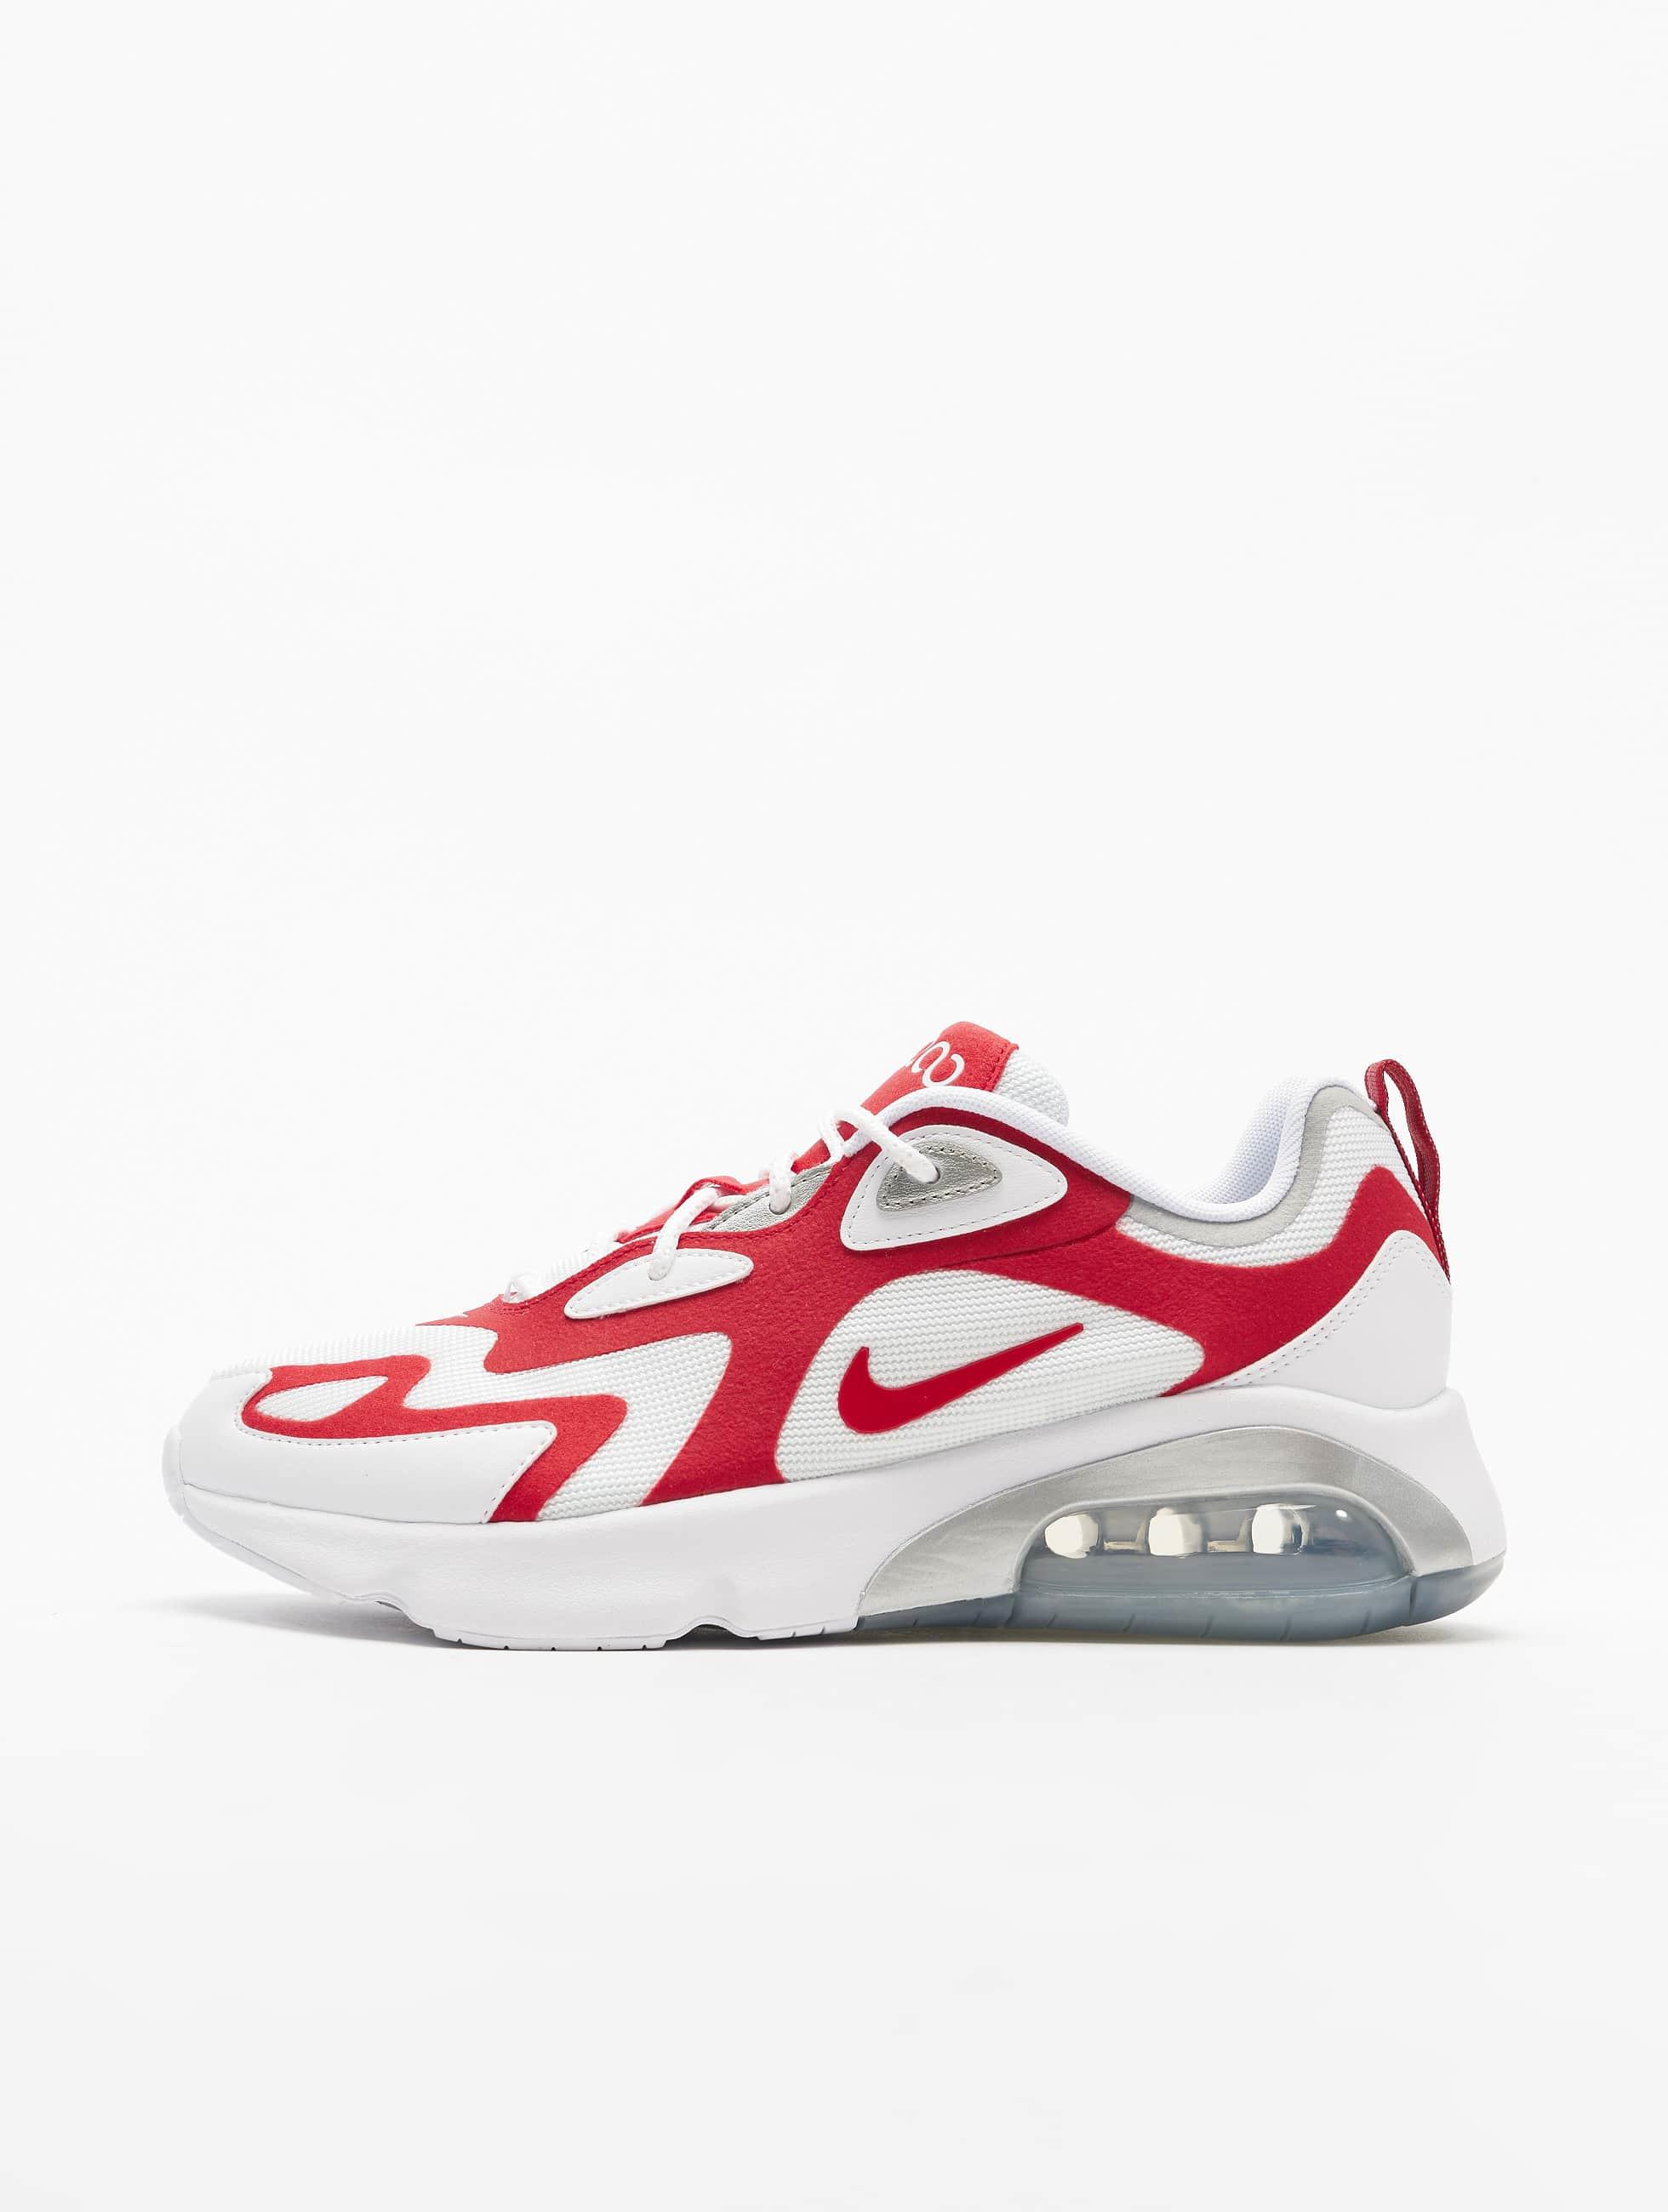 Nike Air Max 200 Sneakers White/University Red/Metallic Silvern